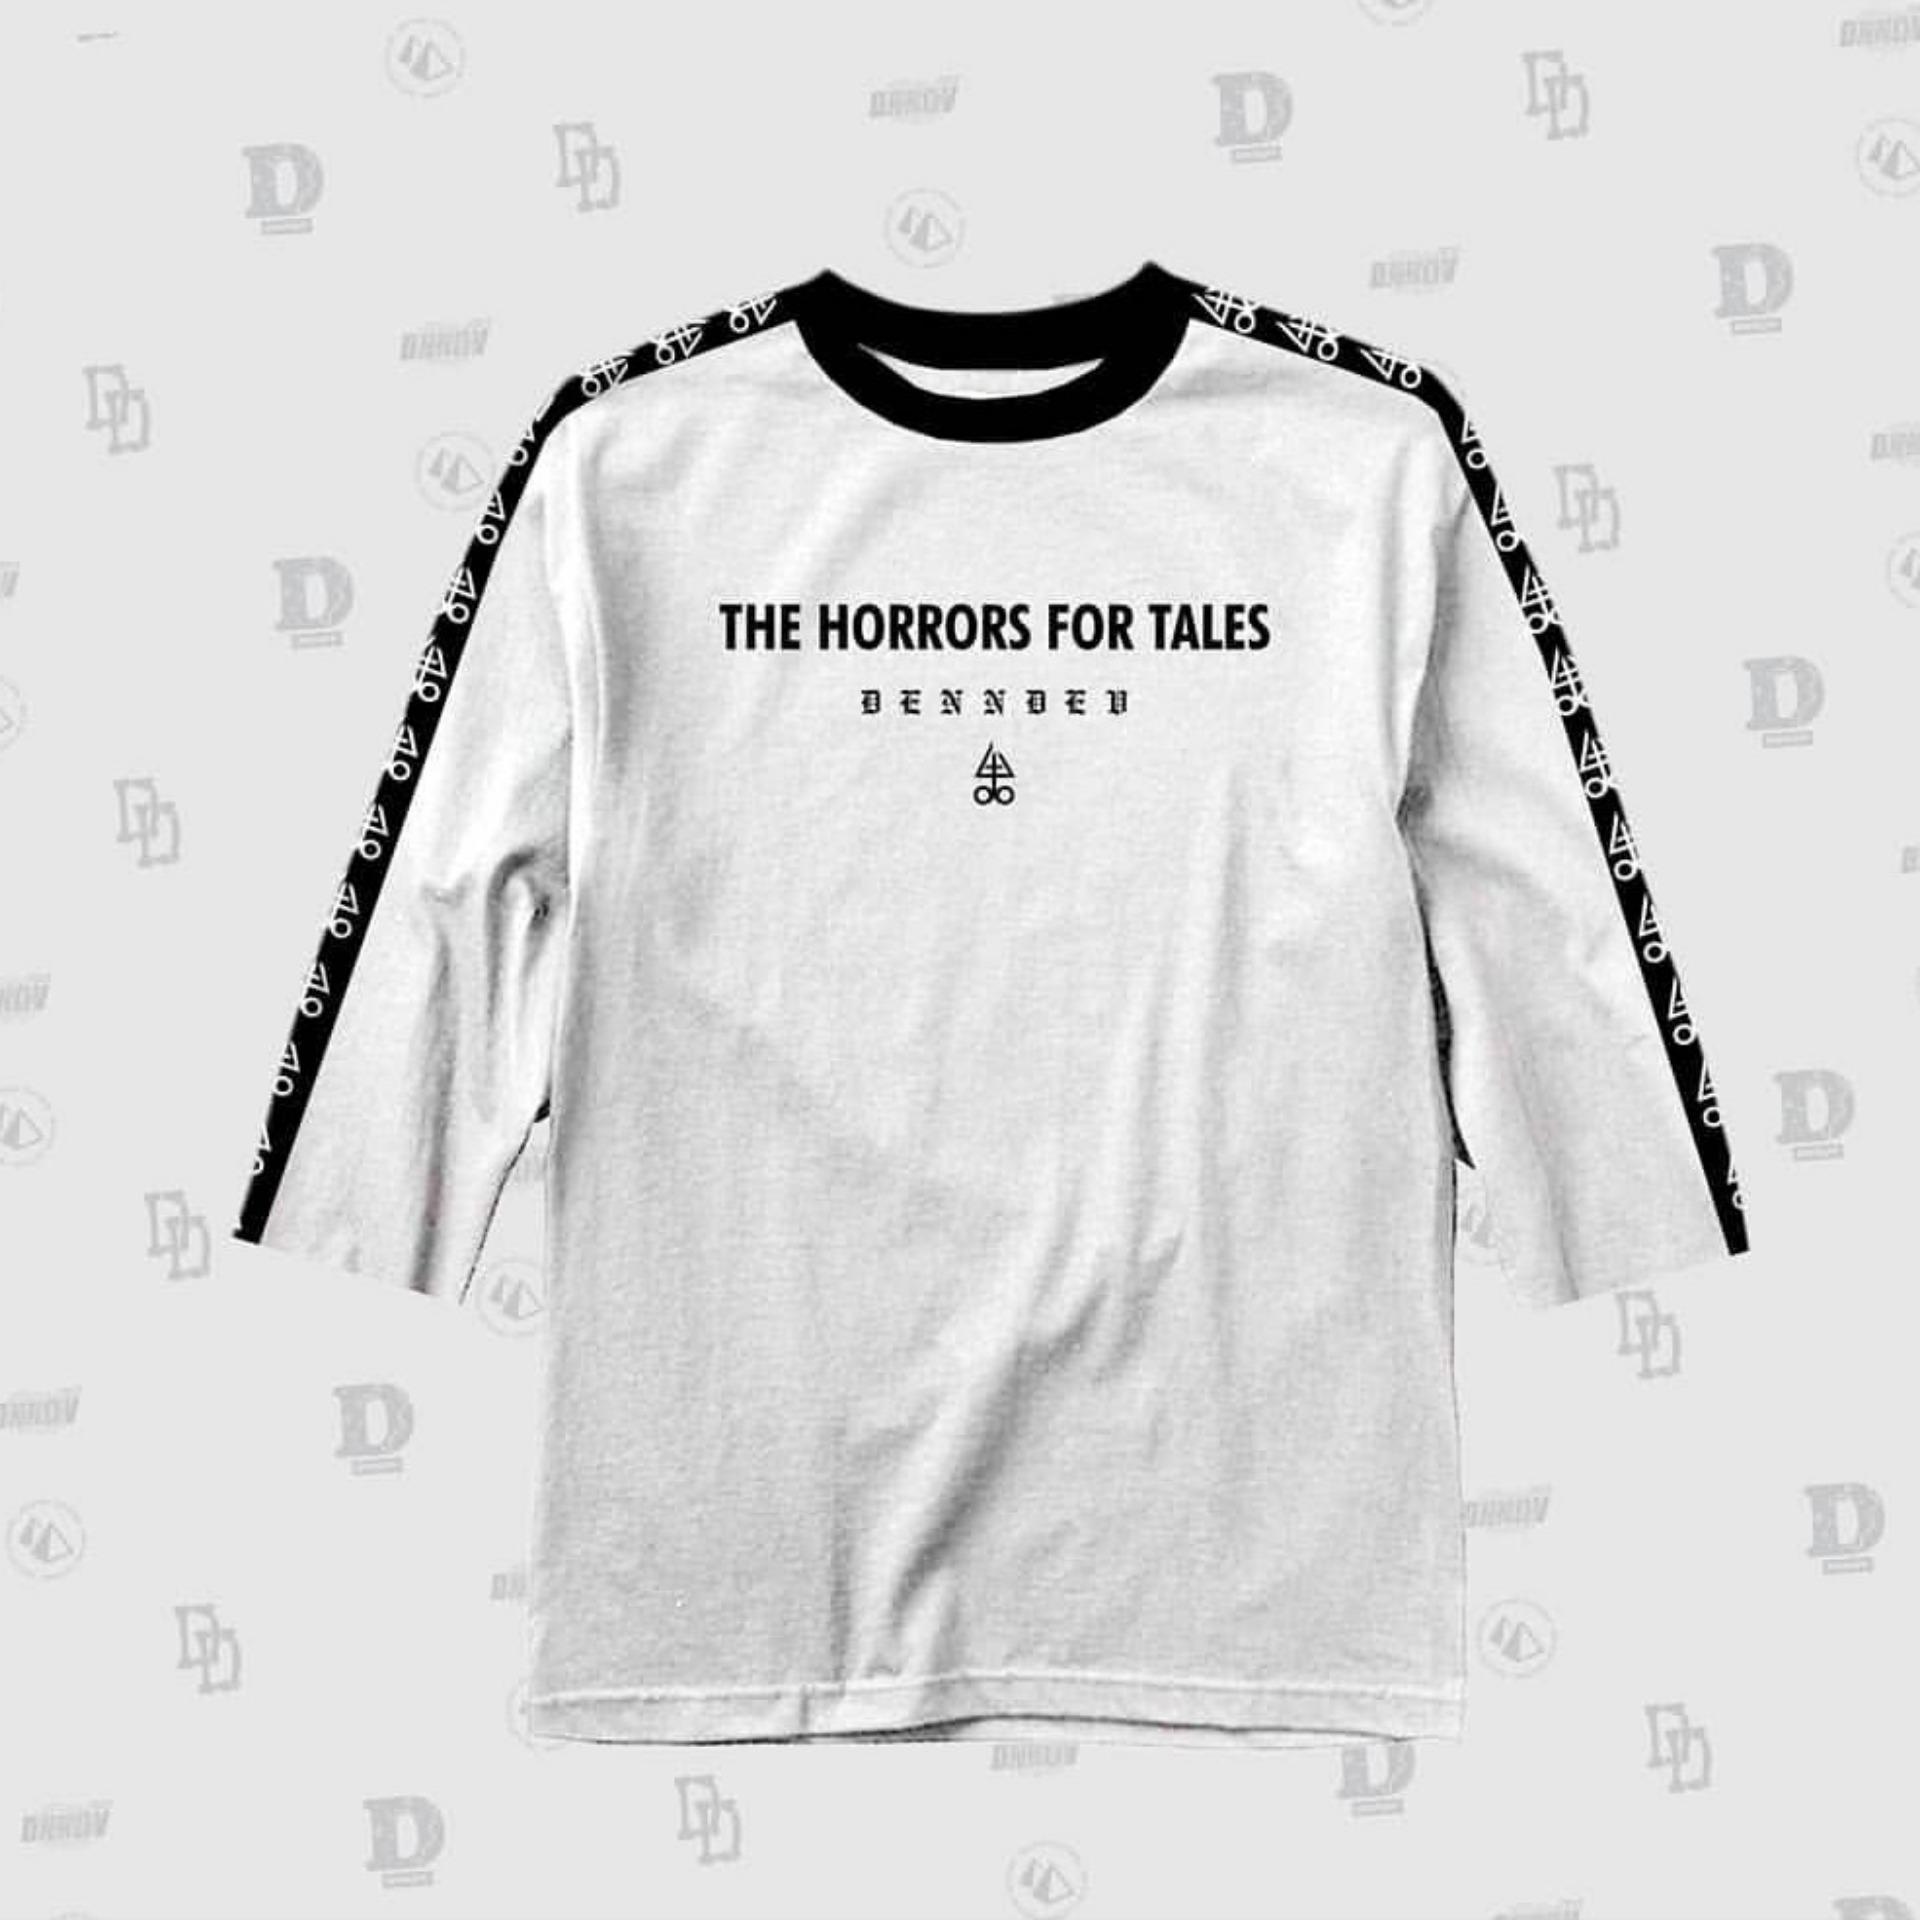 HIGH5 Fashion Pria Kaos 3/4 DND THE HORROR Putih